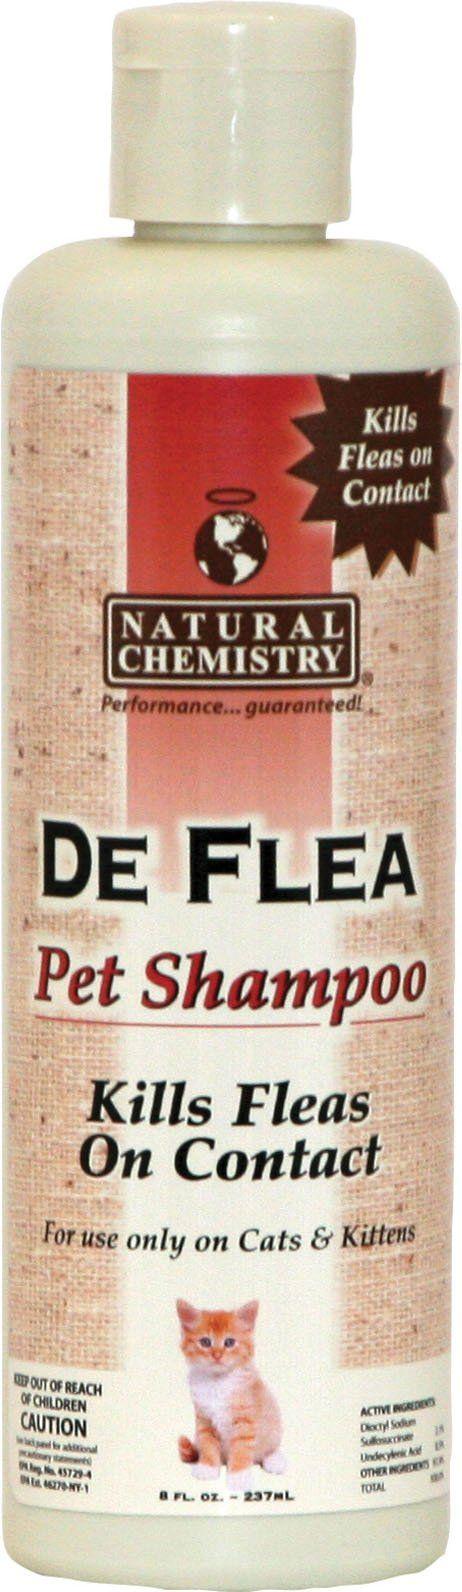 Natural Chemistry D-Deflea Pet Shampoo For Cats 8 Ounce